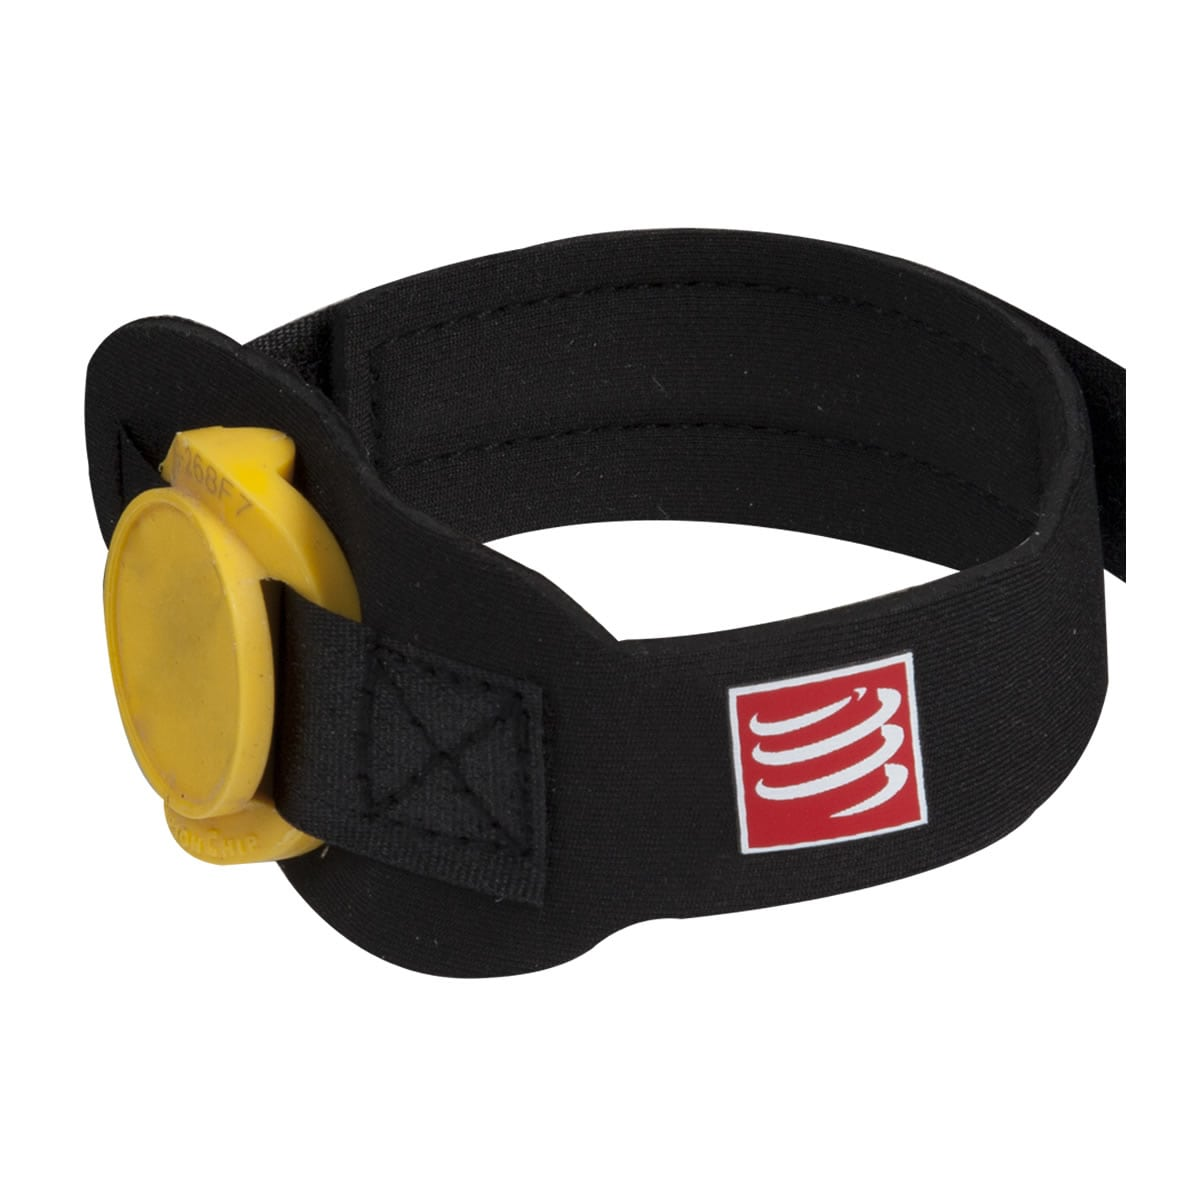 Timing Chipband - Compressport - 024007019